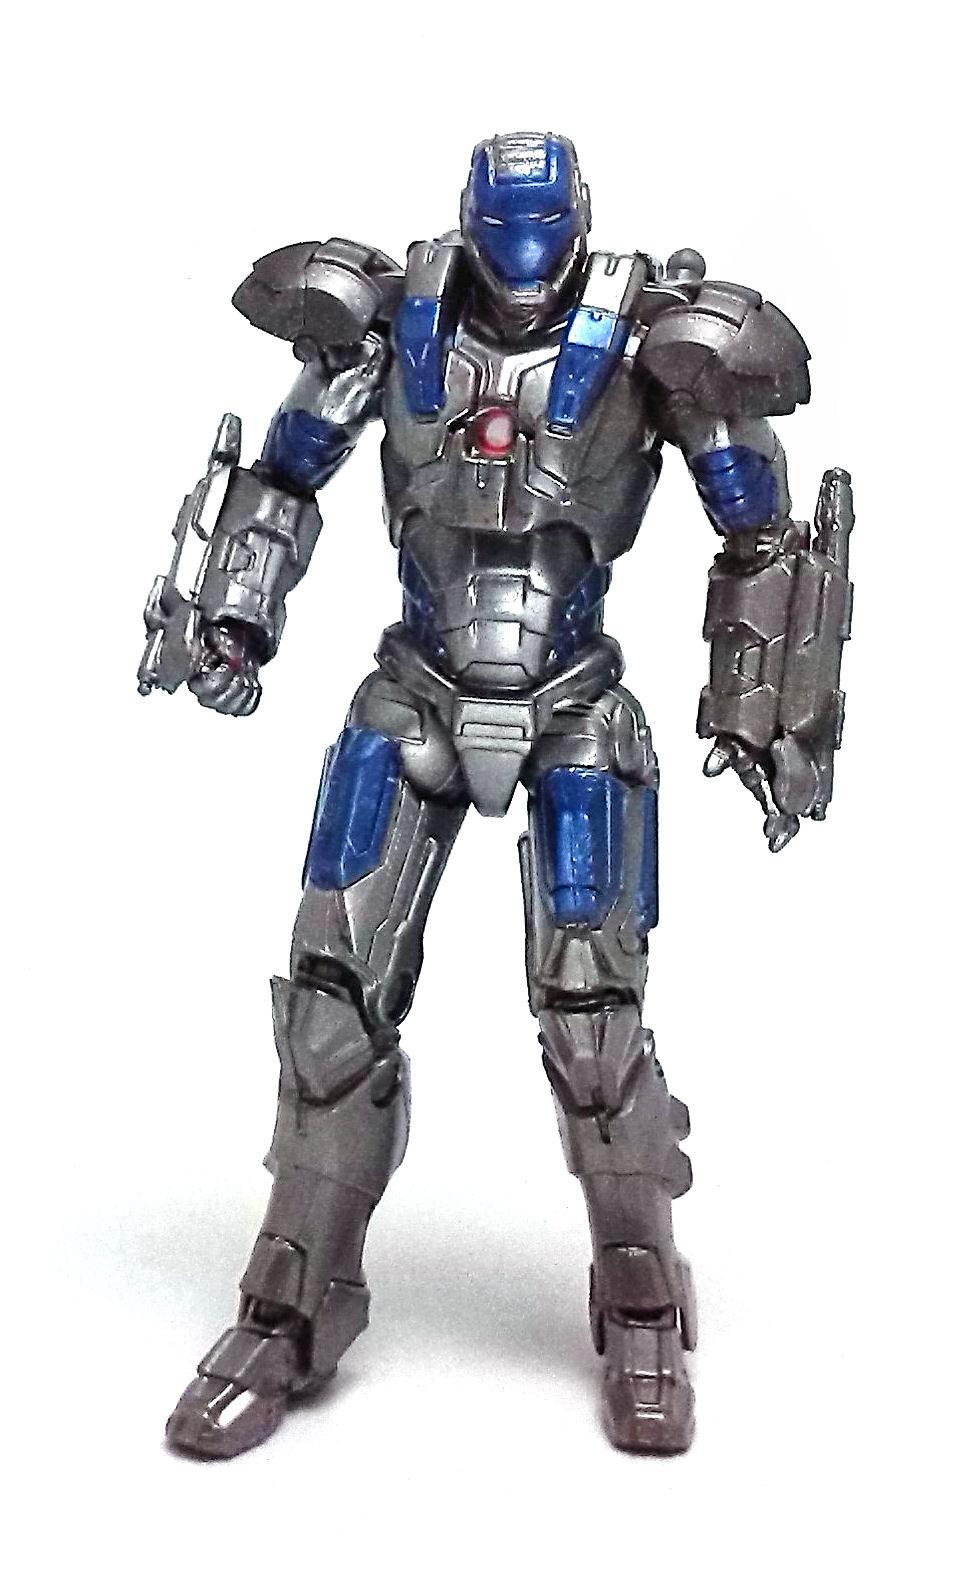 War machine armor